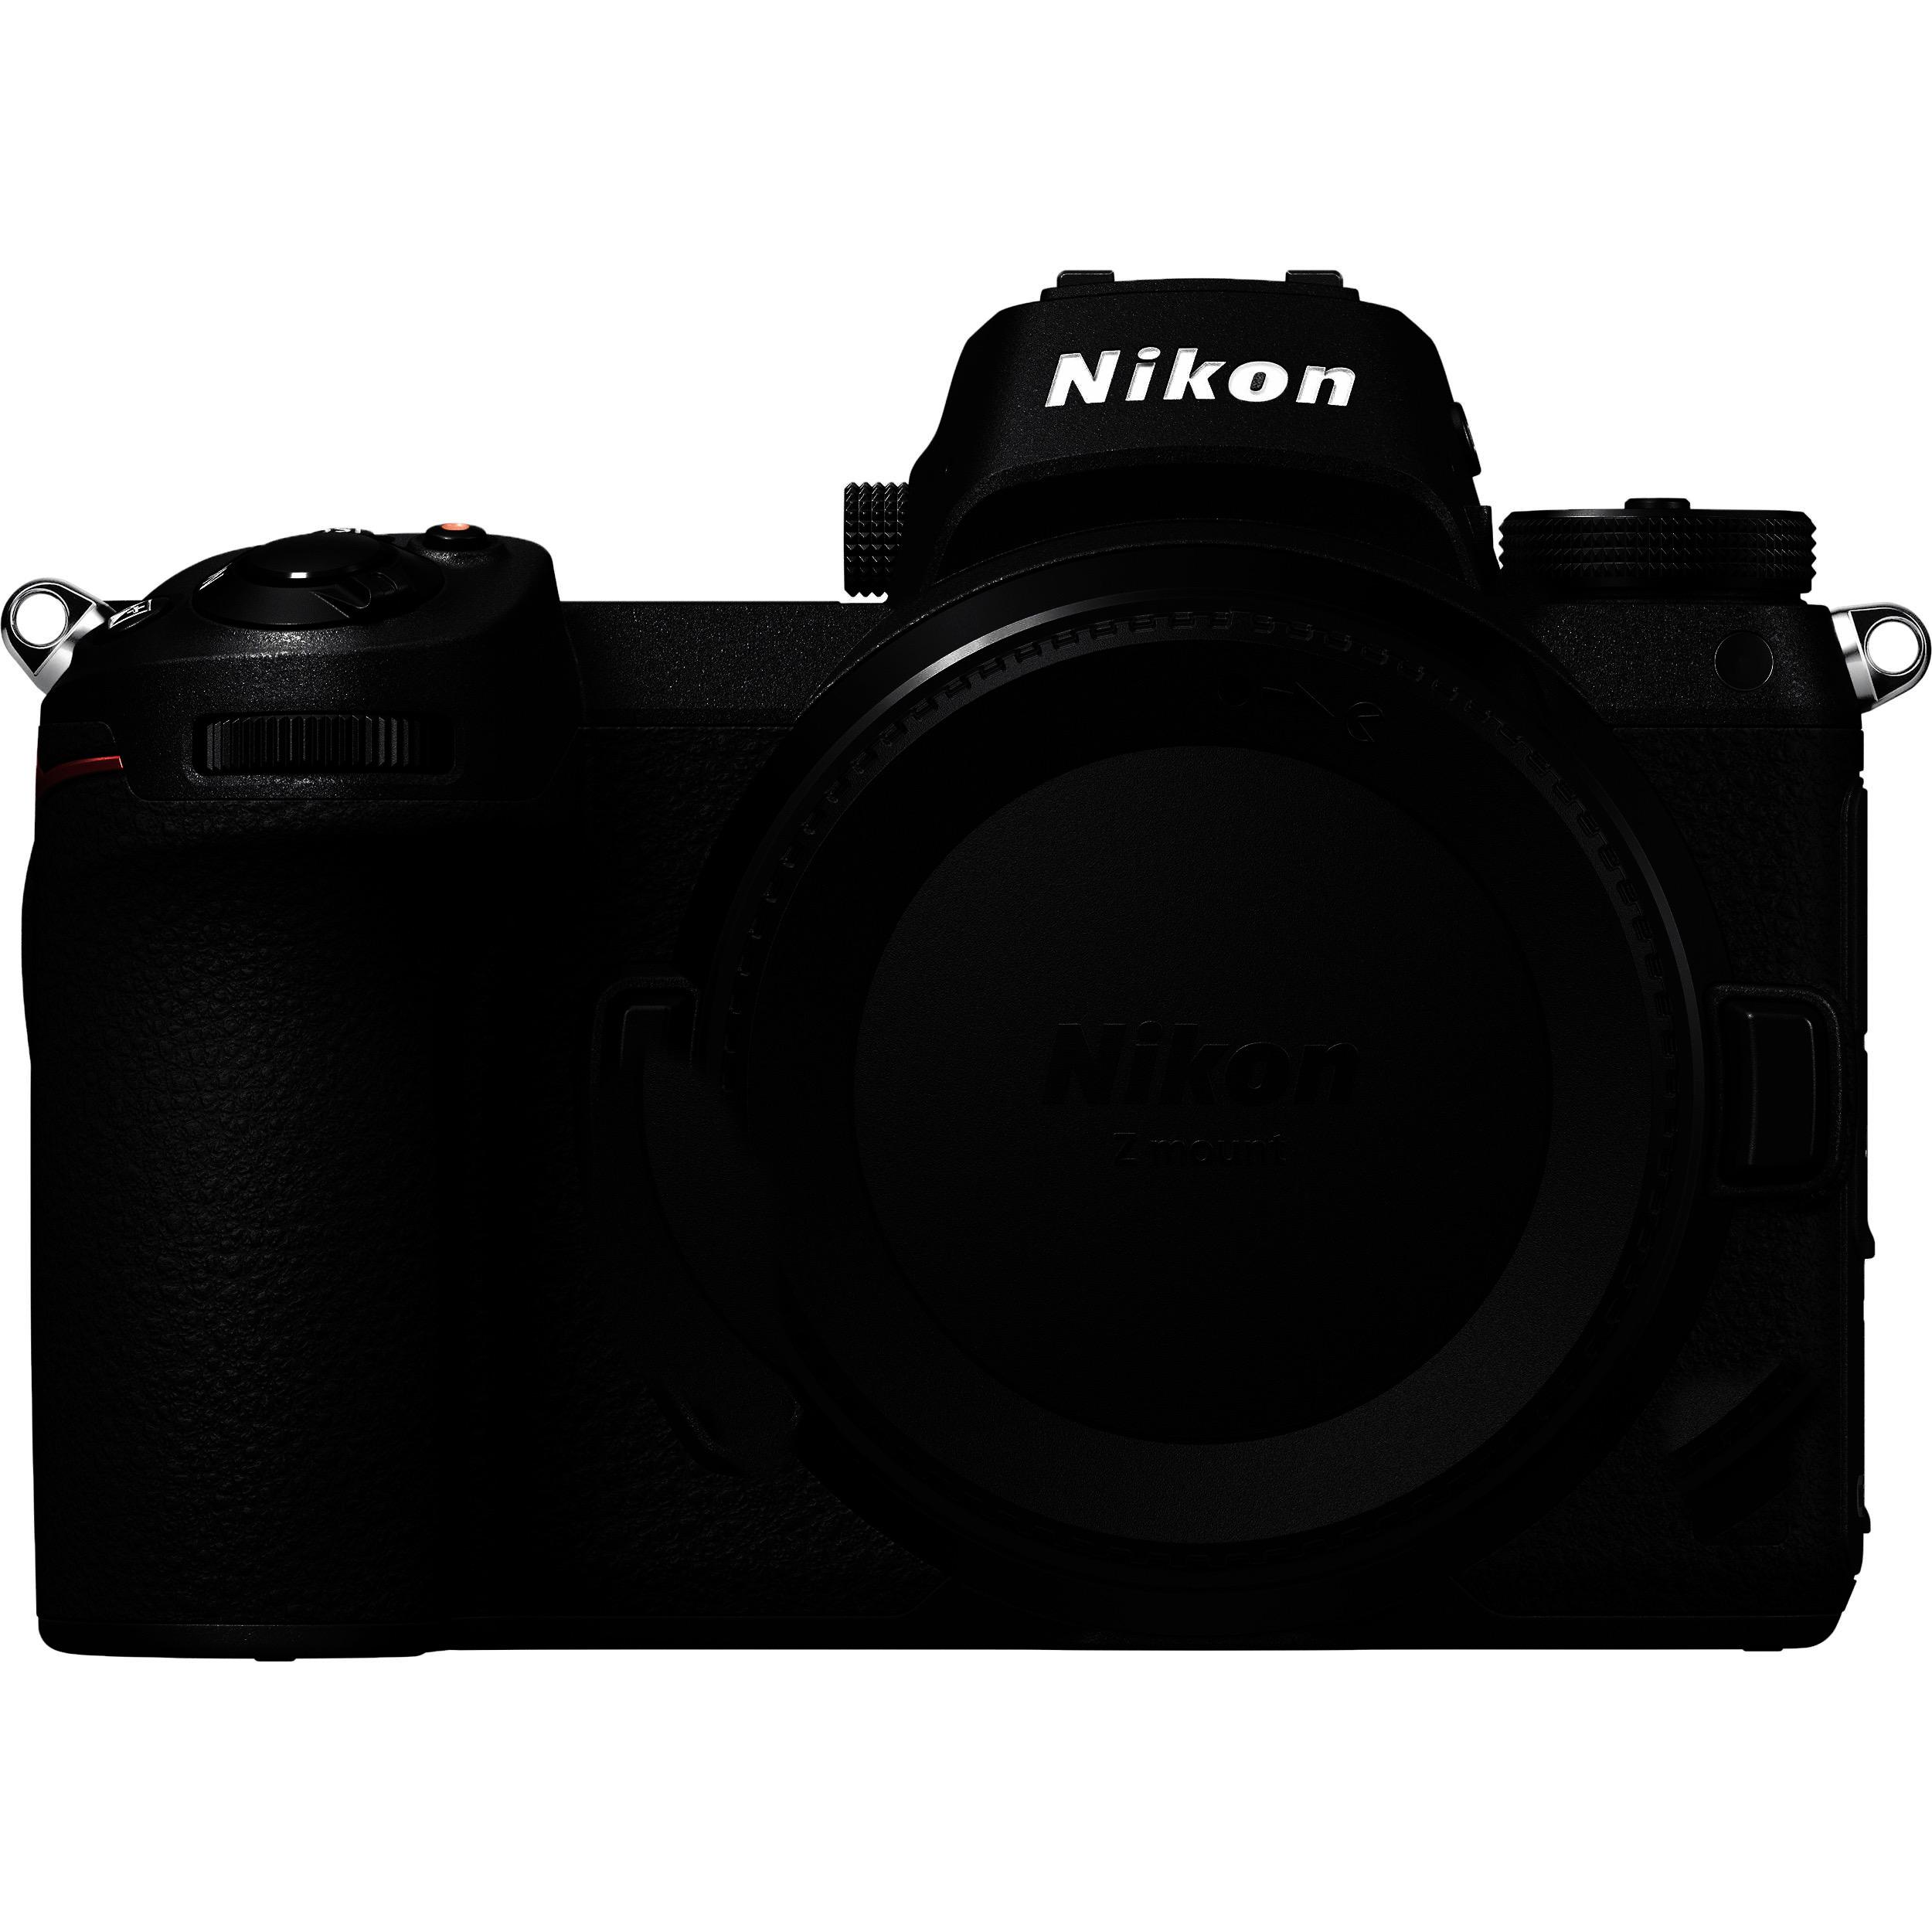 Nikon Z8 予想スペック